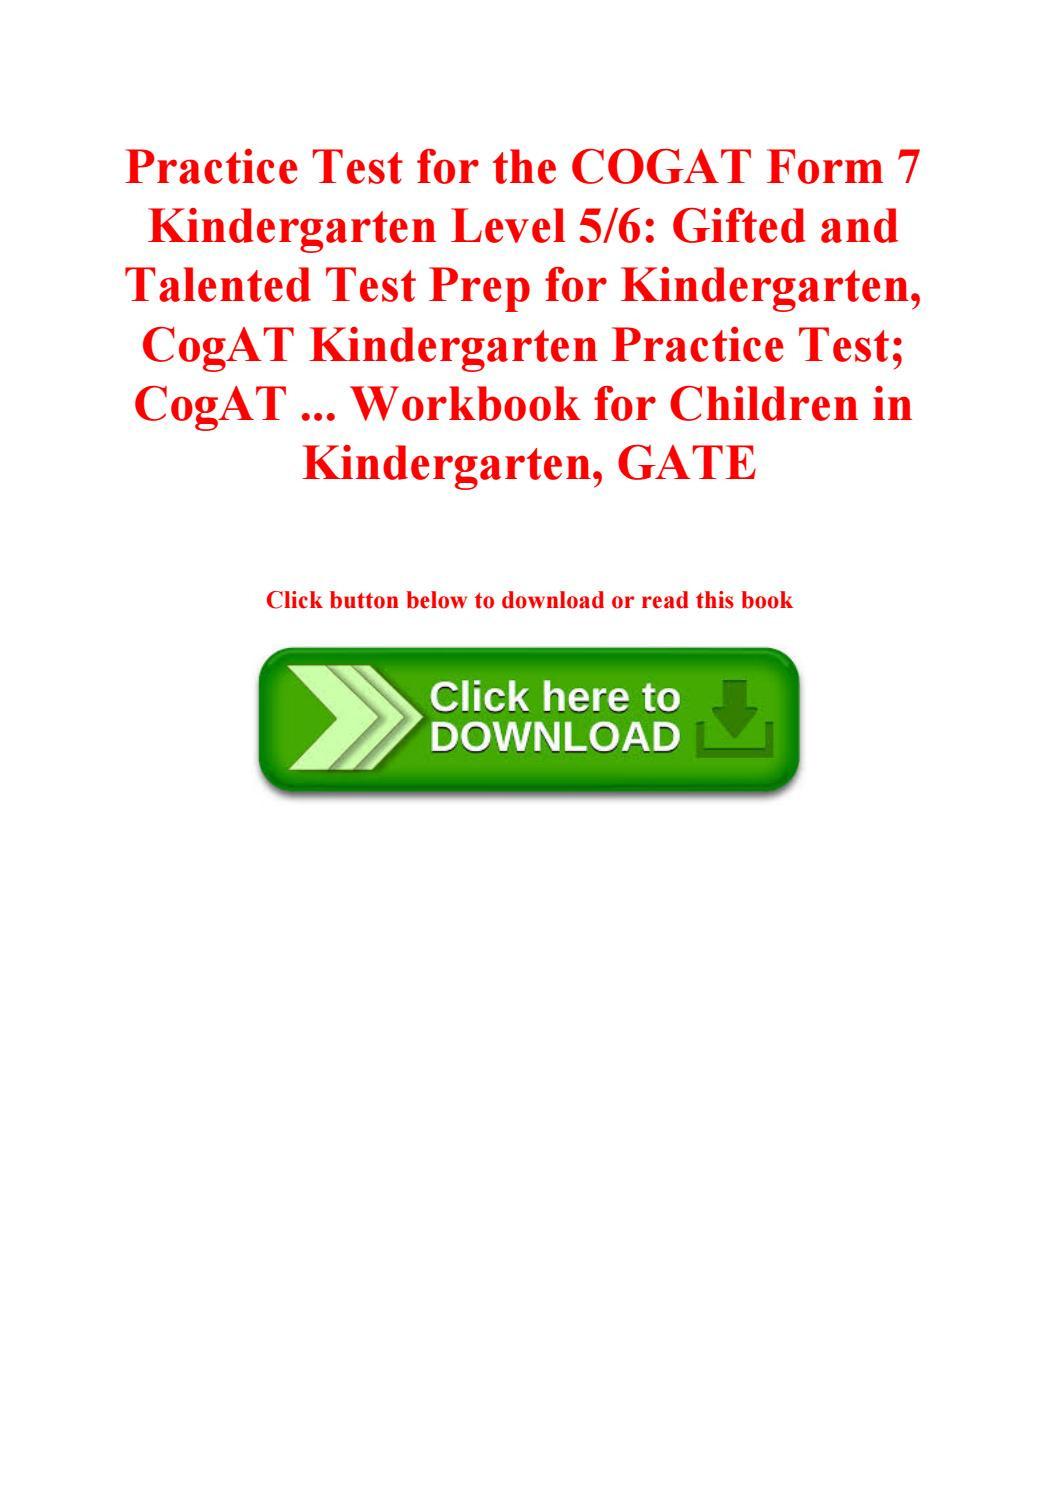 Kindergarten Educational Word Searches Printable Free